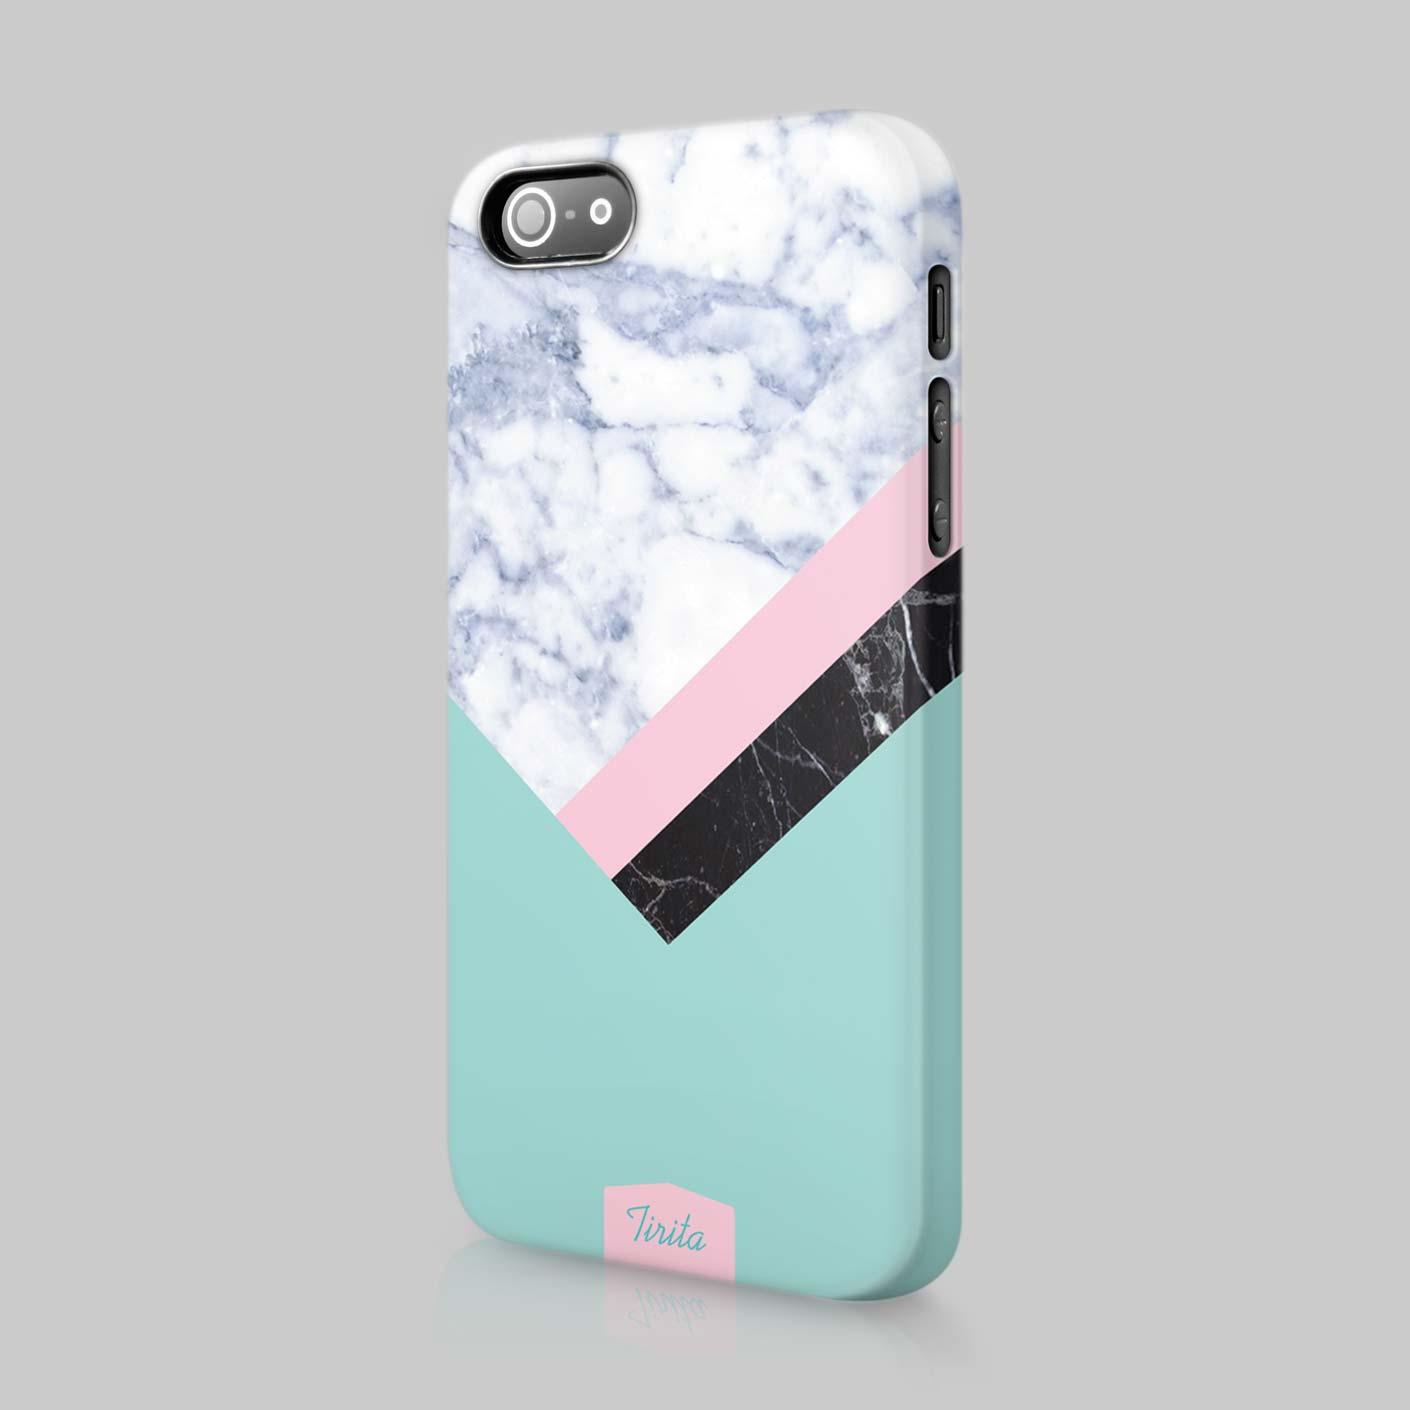 carcasa iphone 6 plus marmol